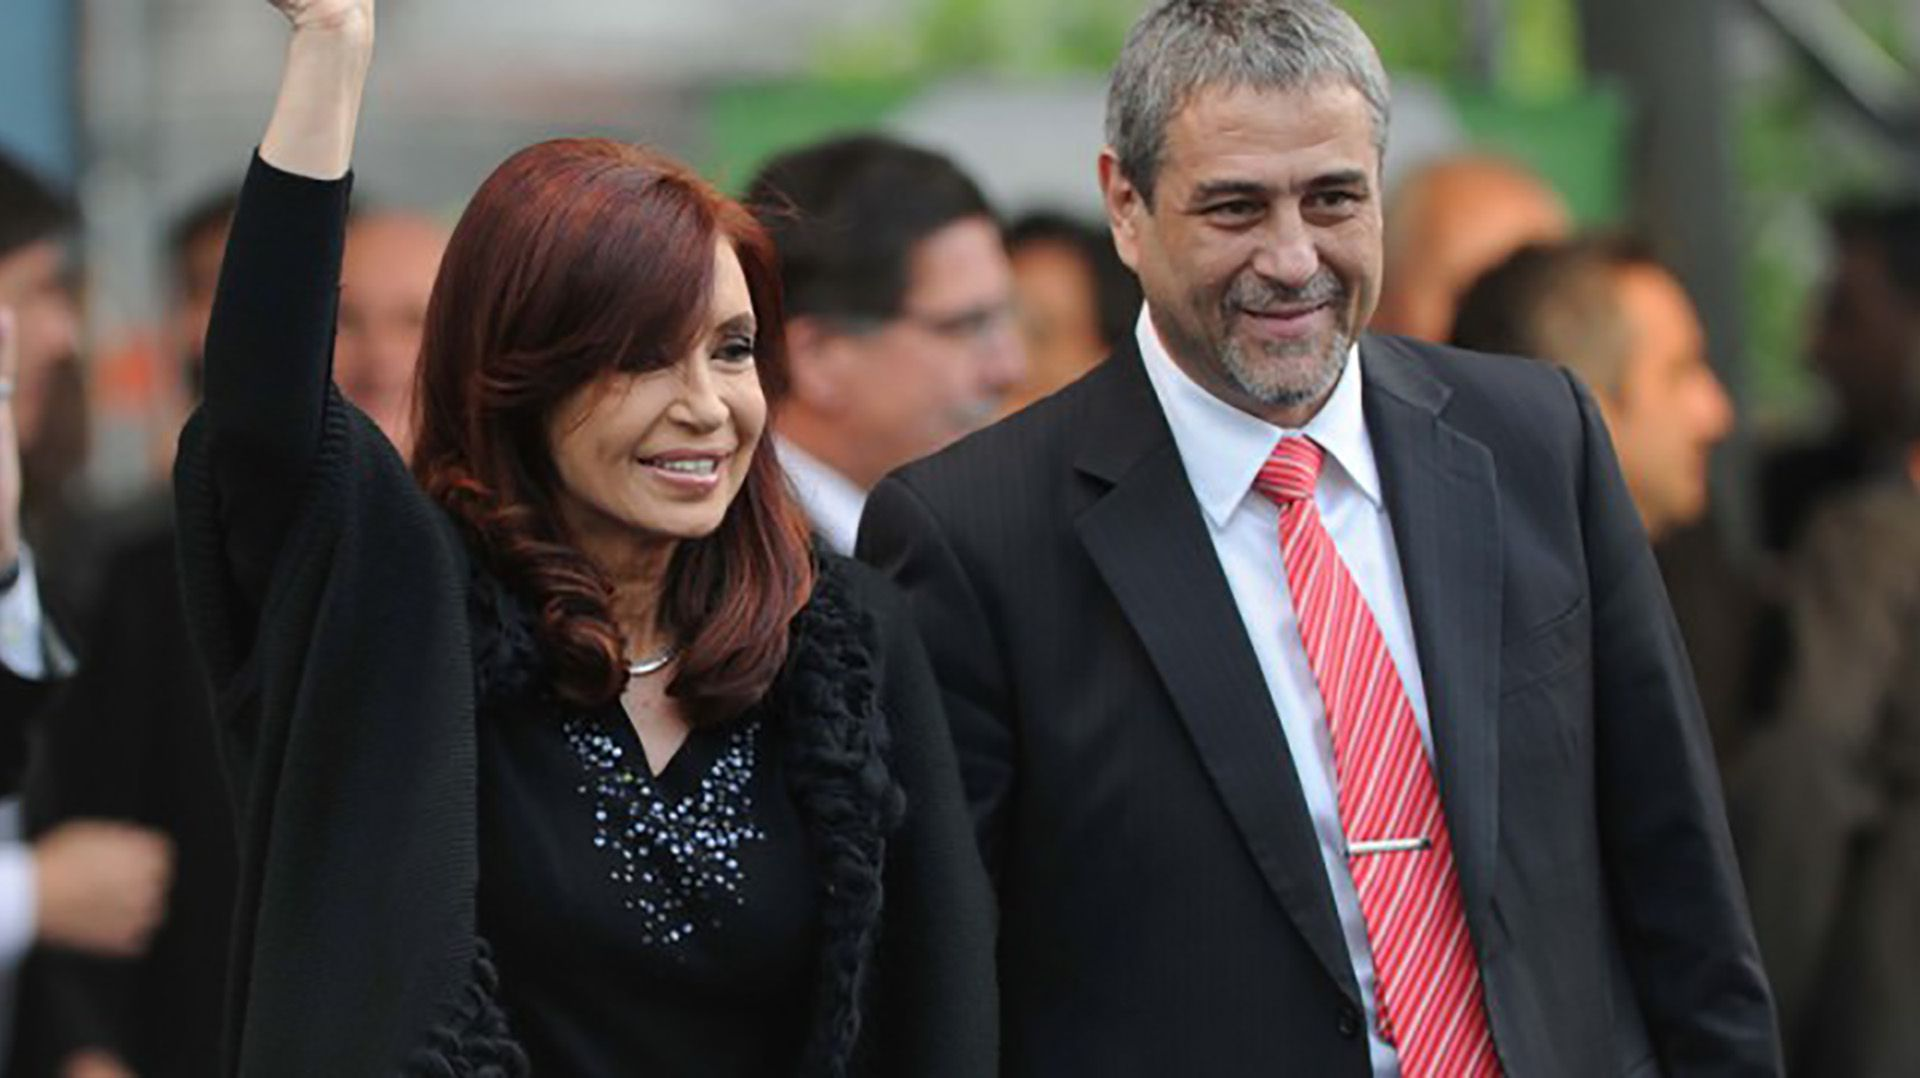 Ferraresi fue vicepresidente del Instituto Patria, fundado por Cristina Fernández de Kirchner